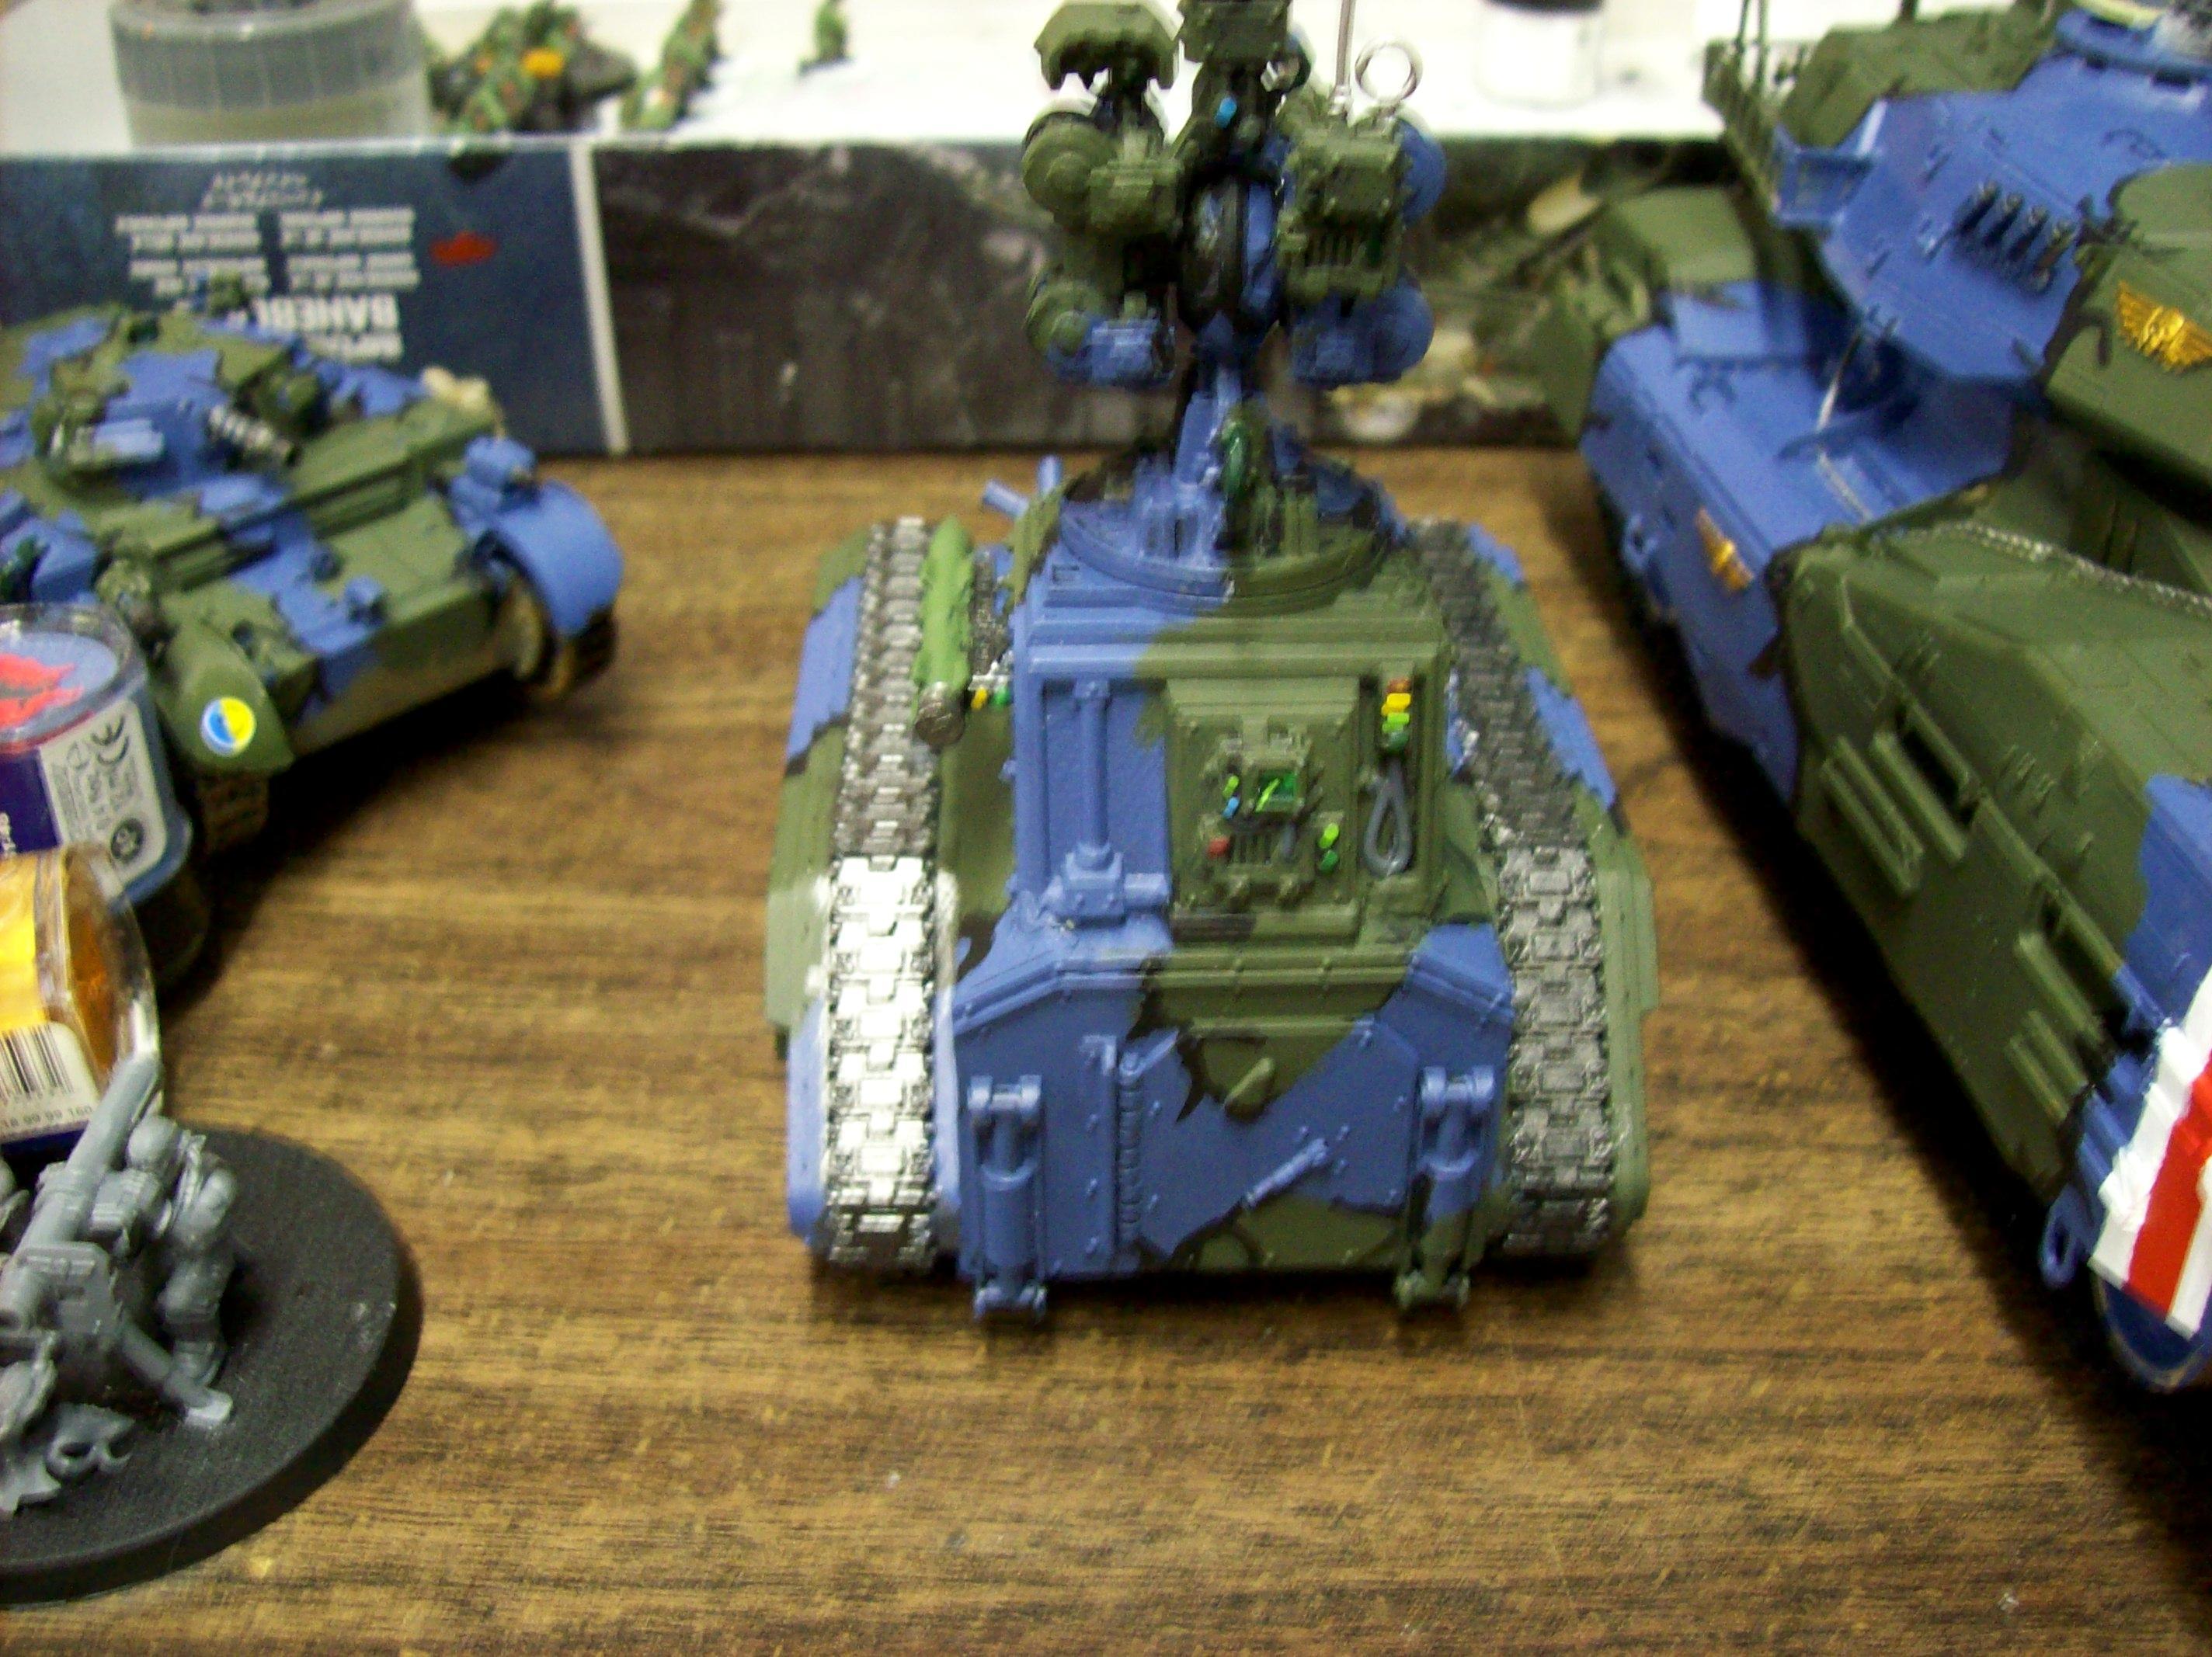 Apc, Camouflage, Chimera, Conversion, Hydra, Ifv, Imperial Guard, Rear View, Tank